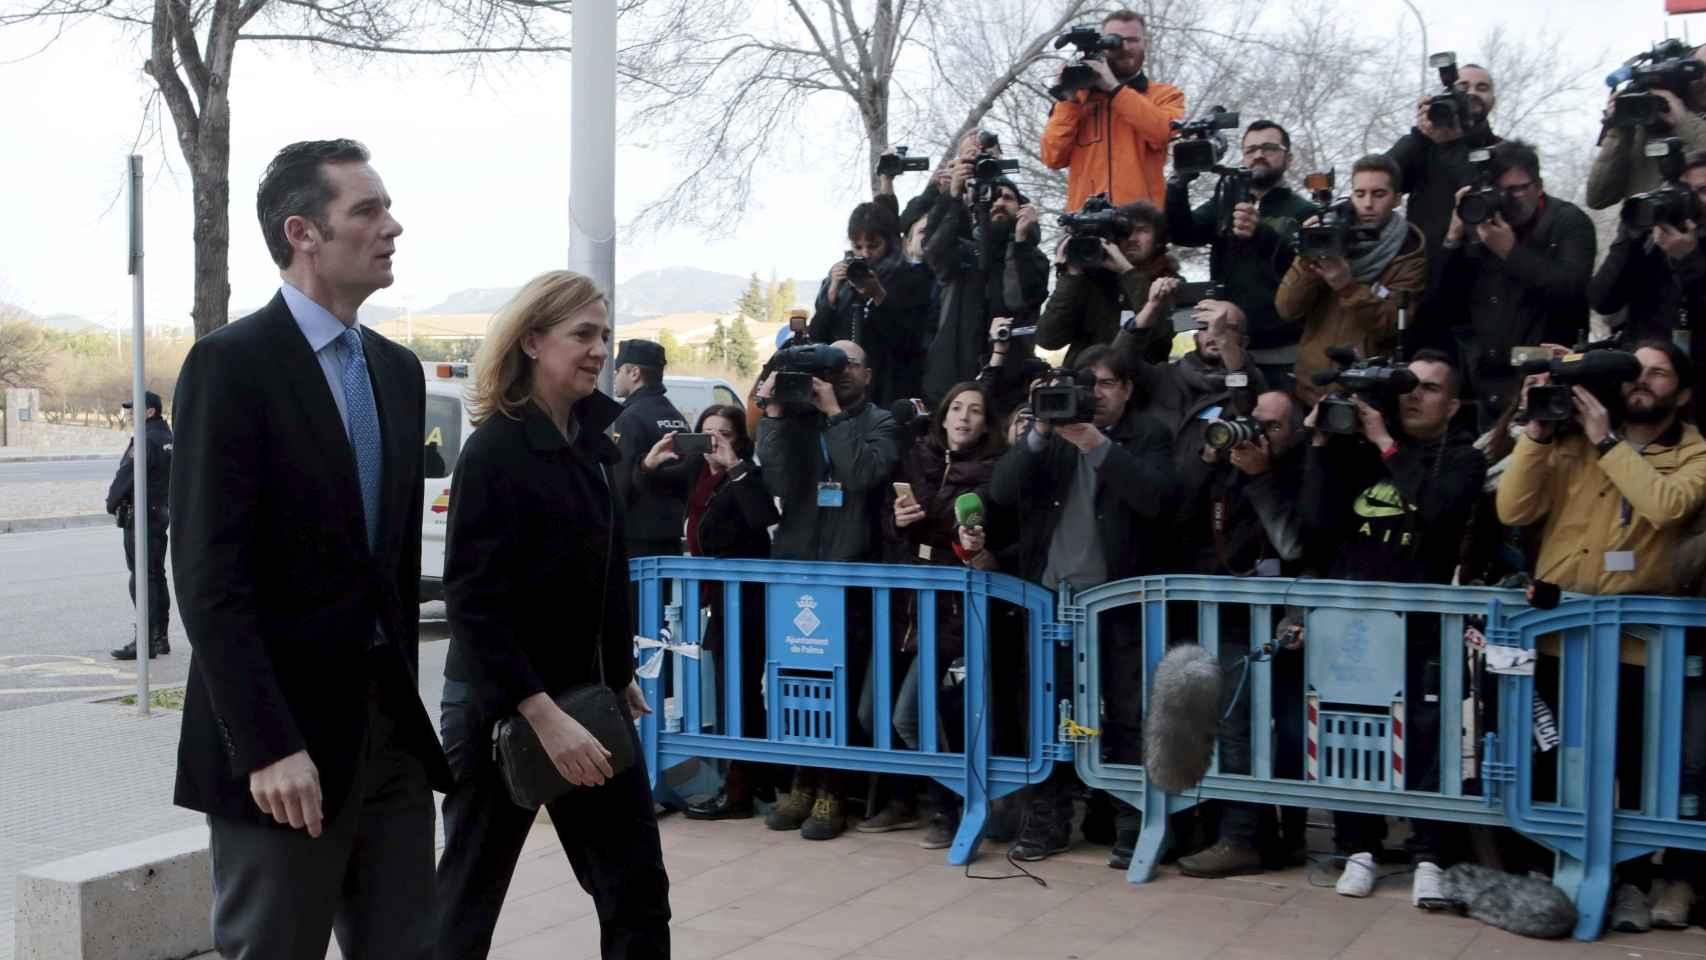 La infanta Cristina e Iñaki Urdangarín a su llegada al juicio en Palma.